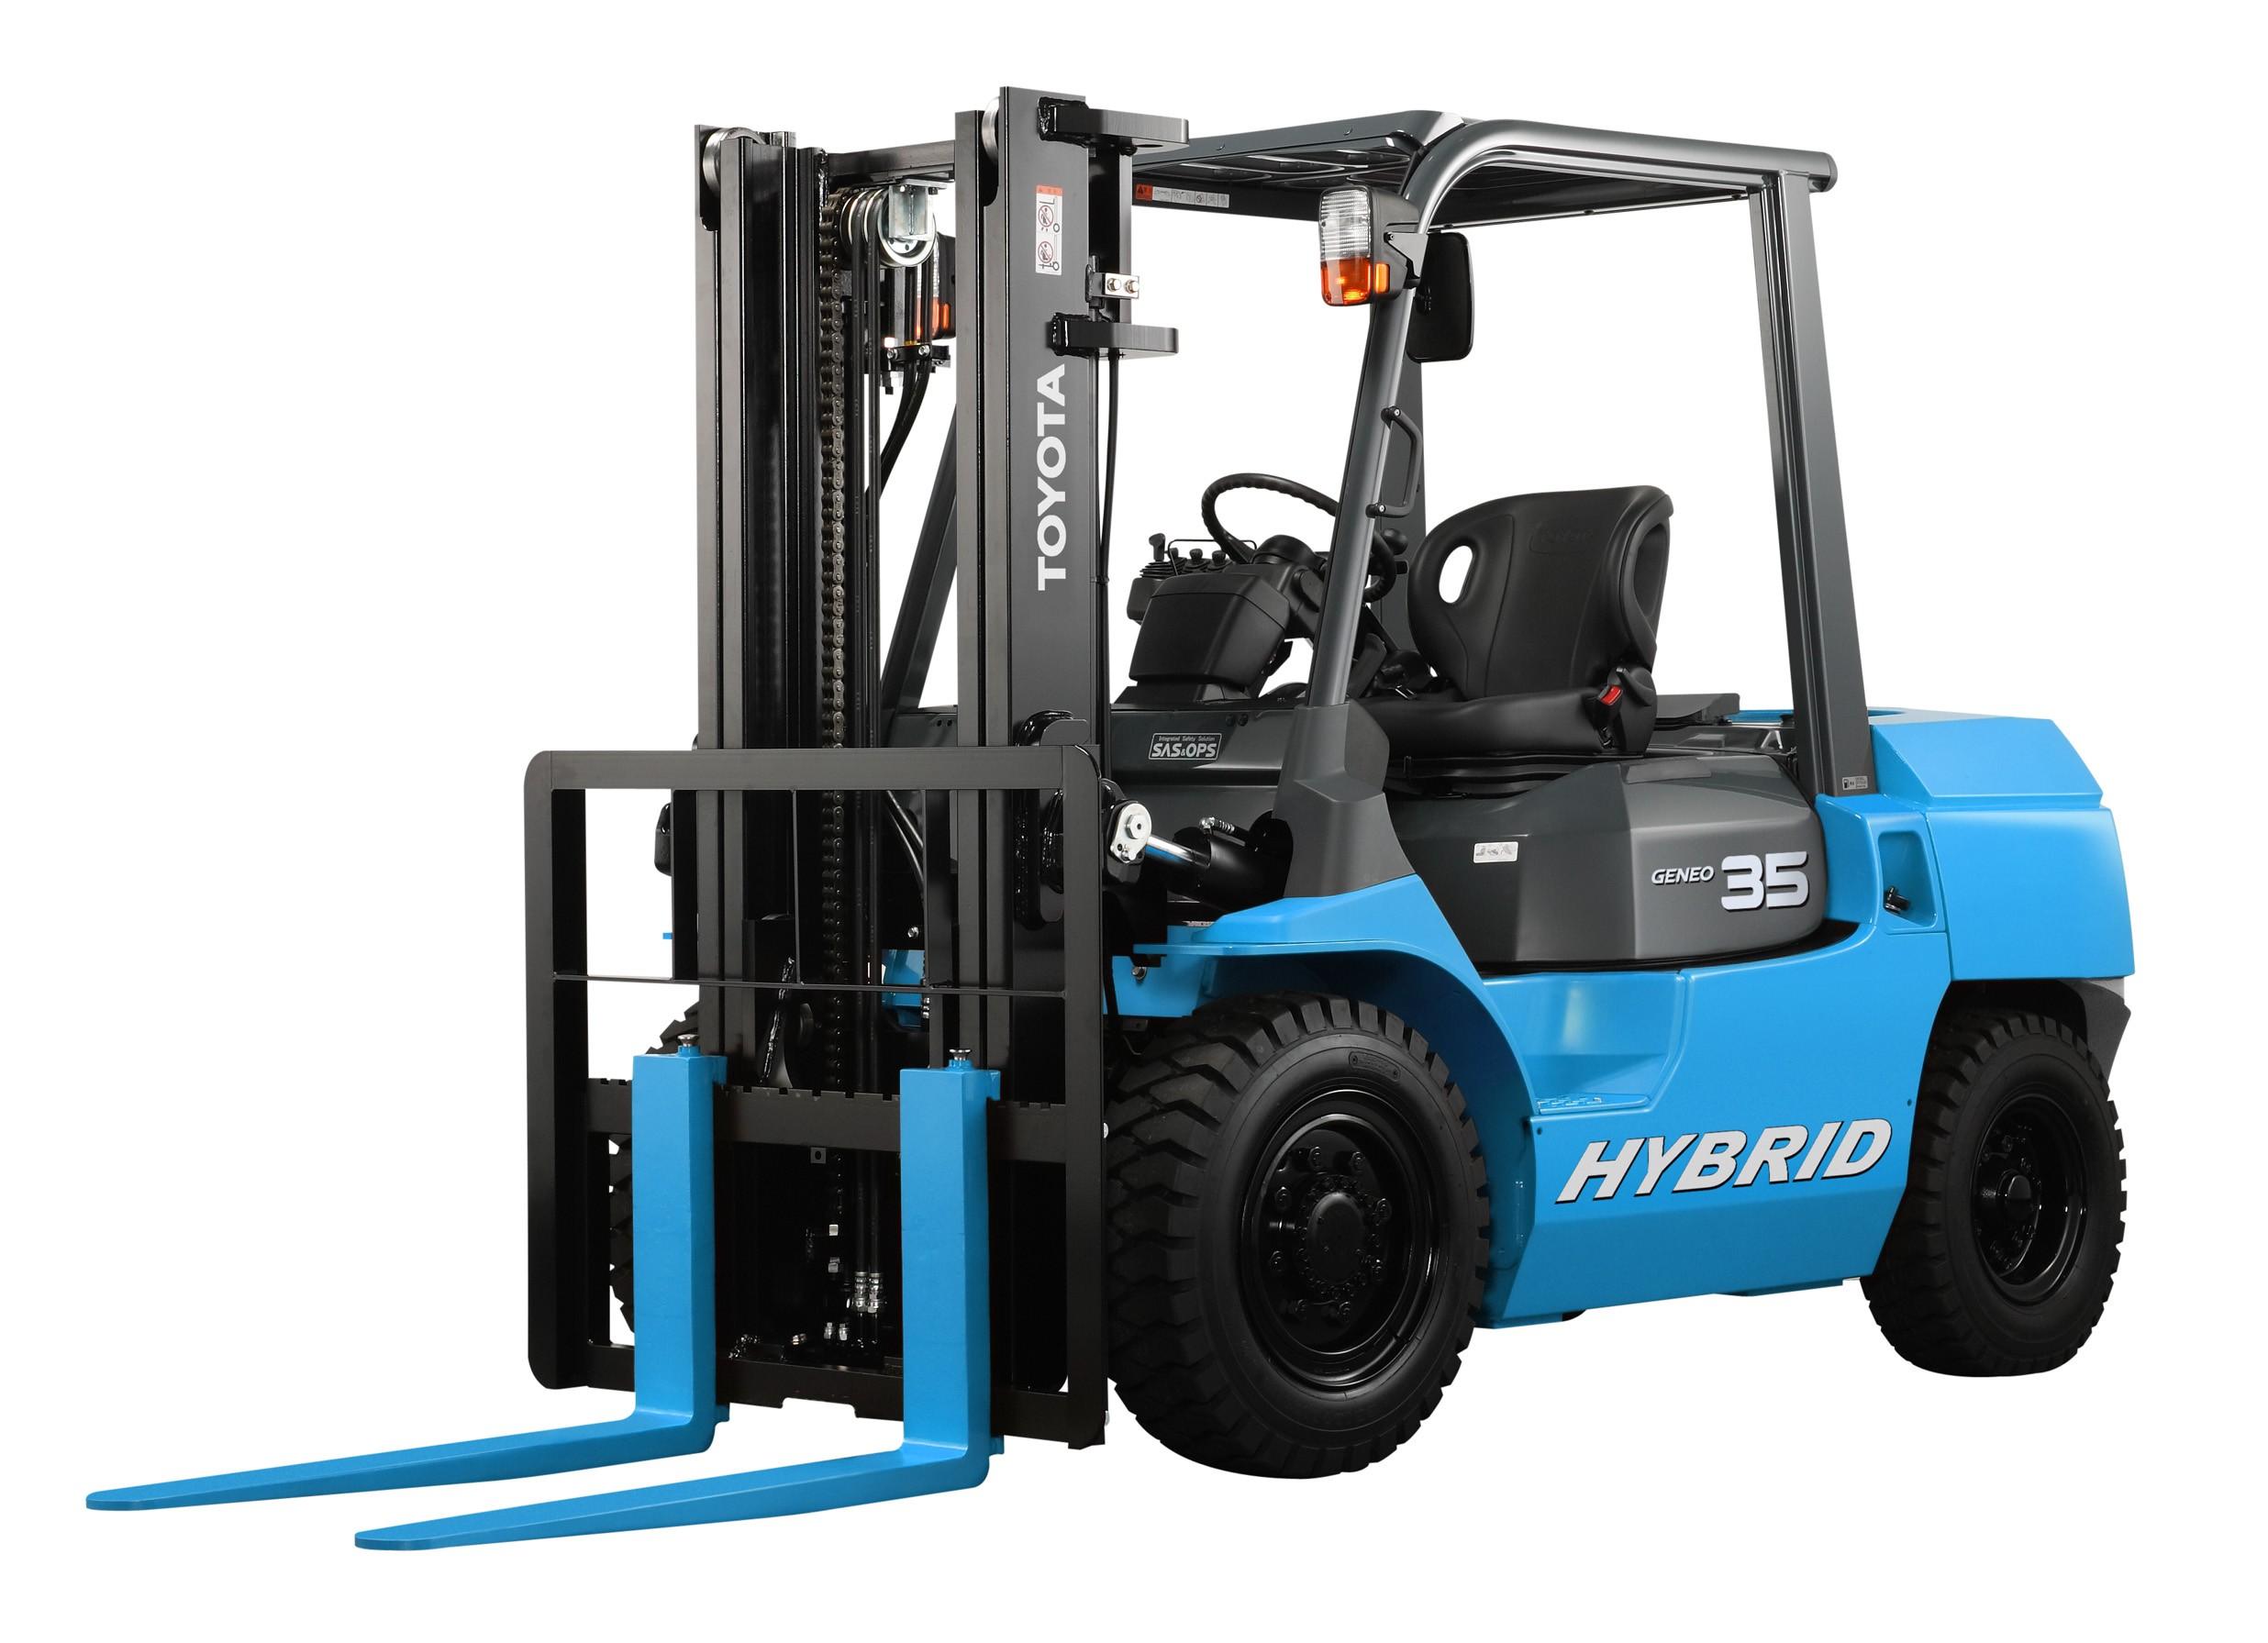 Hybrid Lift Truck